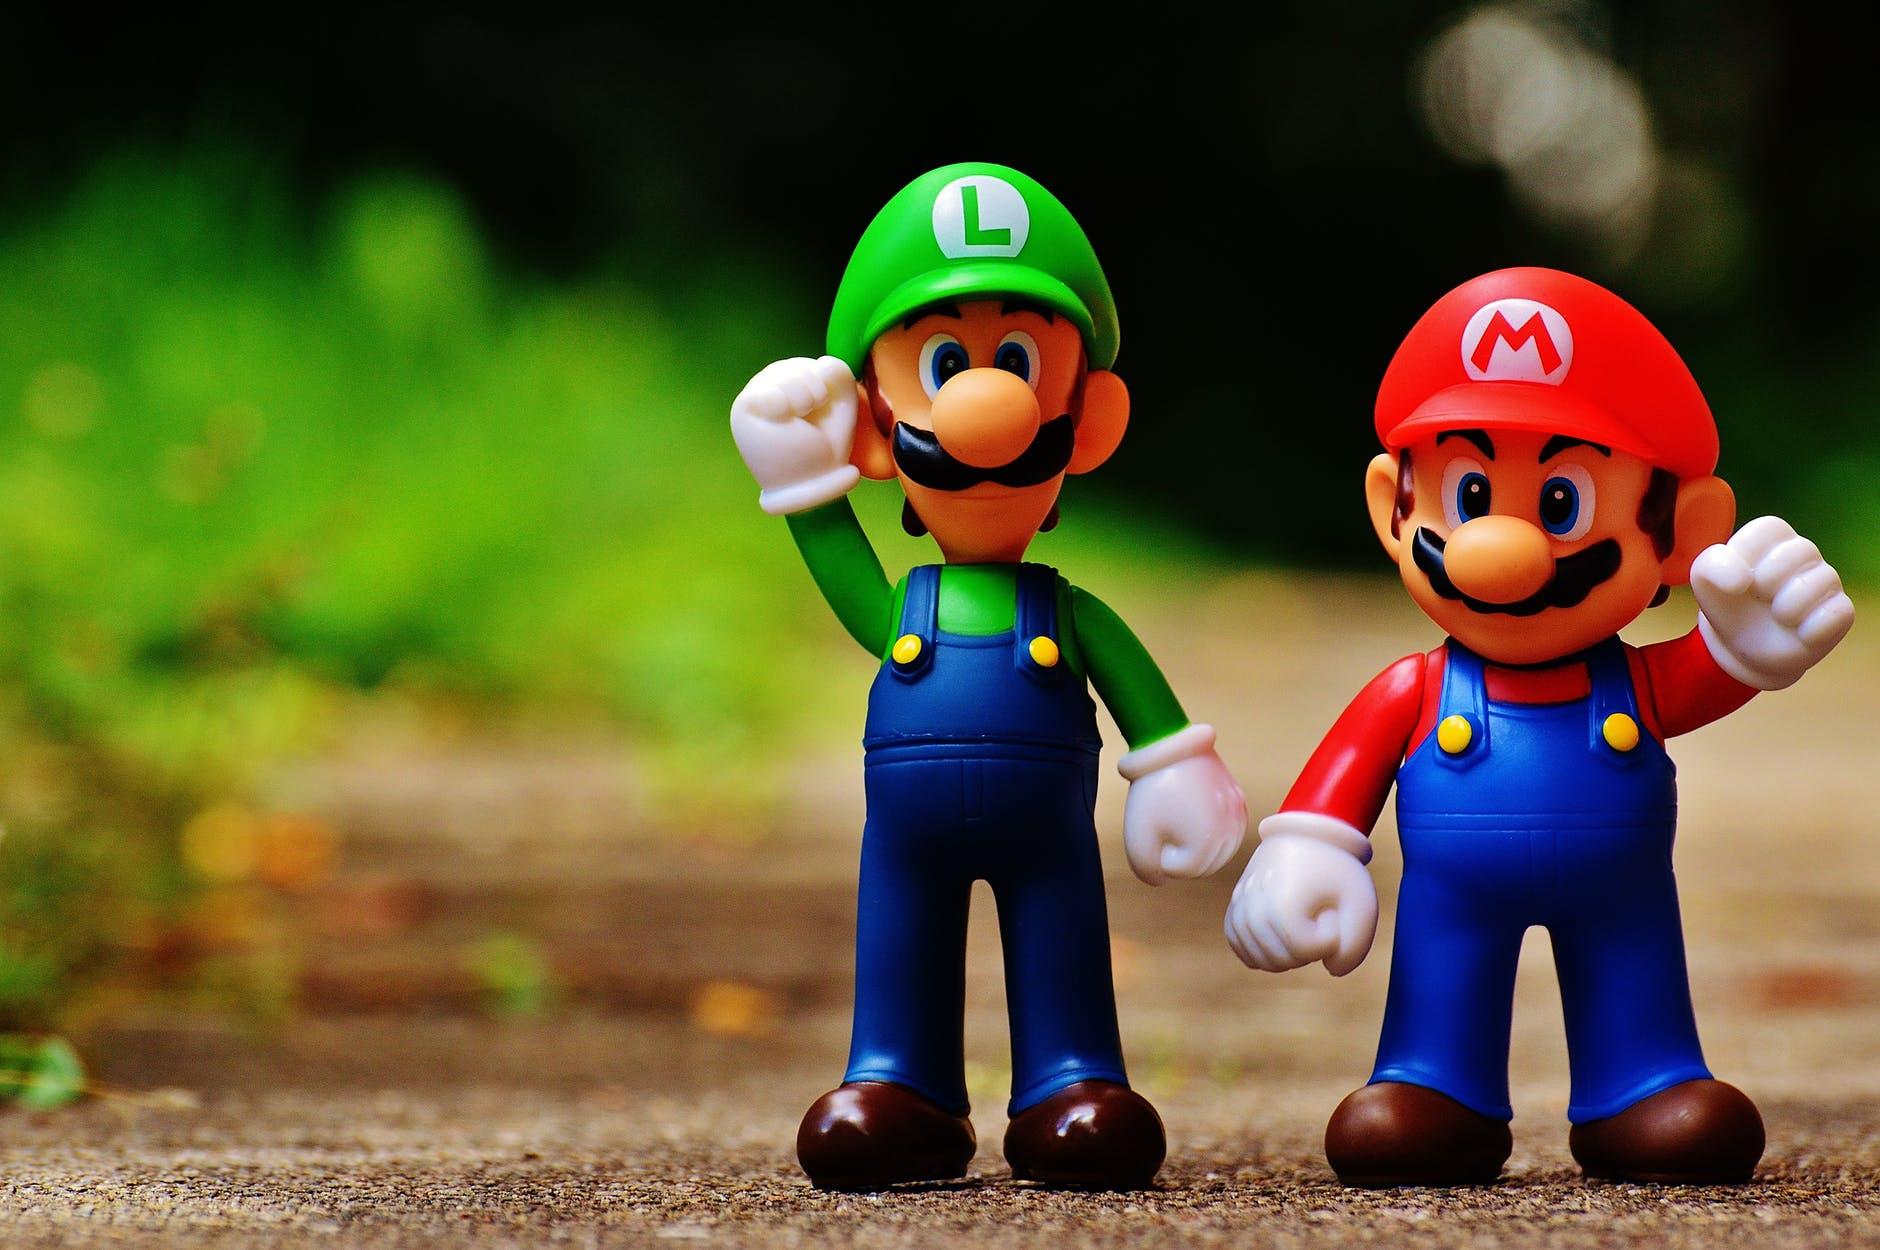 Mario-Luigi-Figuren-lustig-163157.jpeg